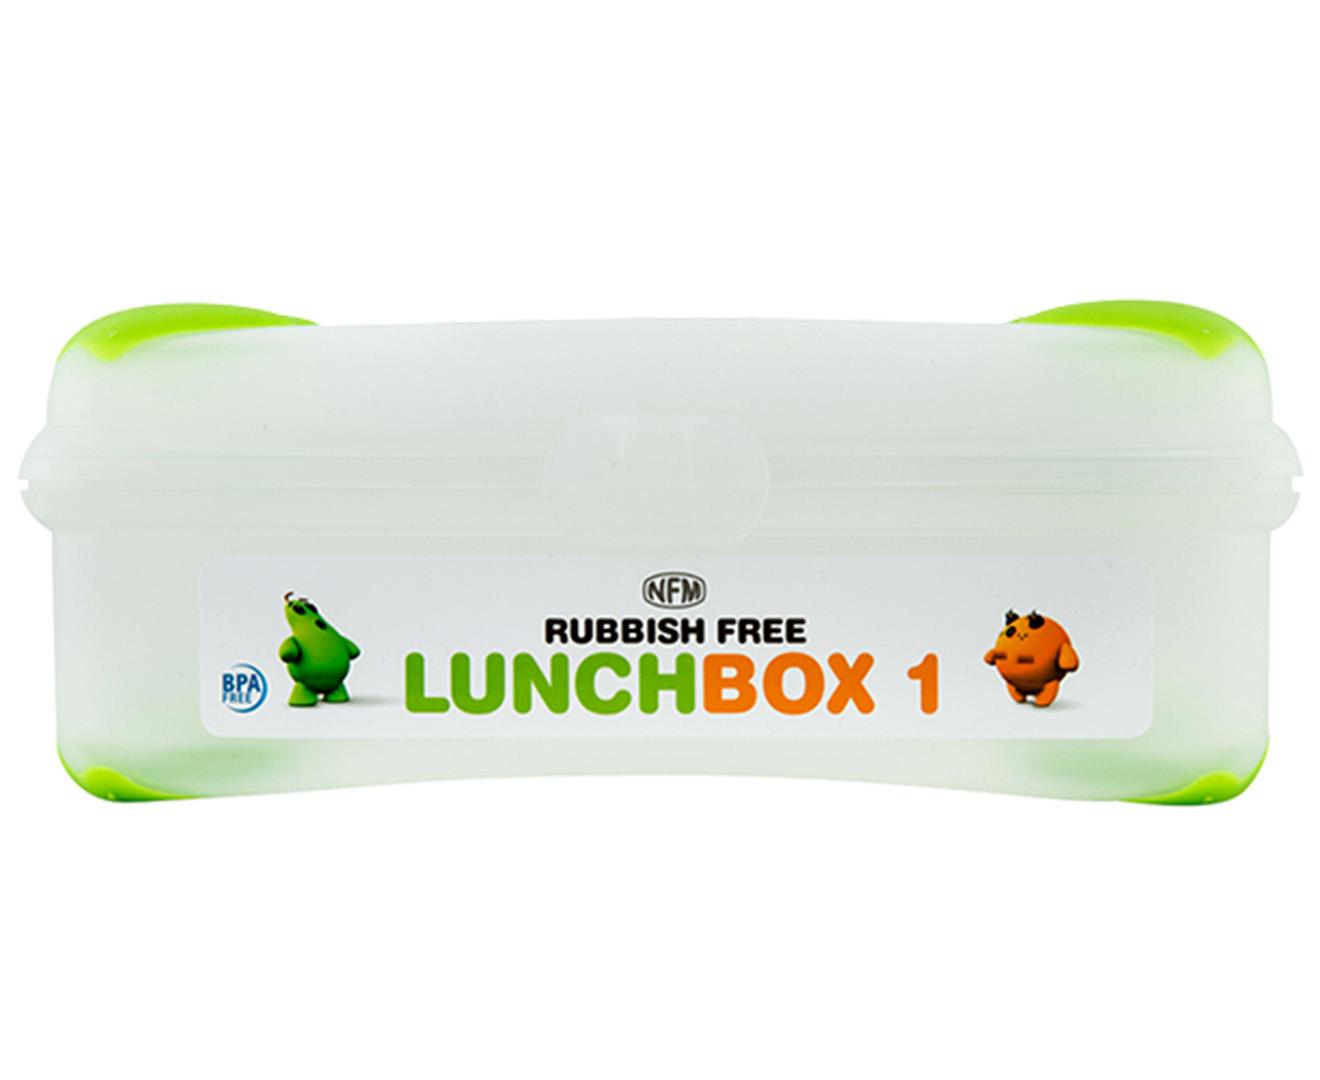 Smash Nude Food Movers Lunchbox Randomly Selected